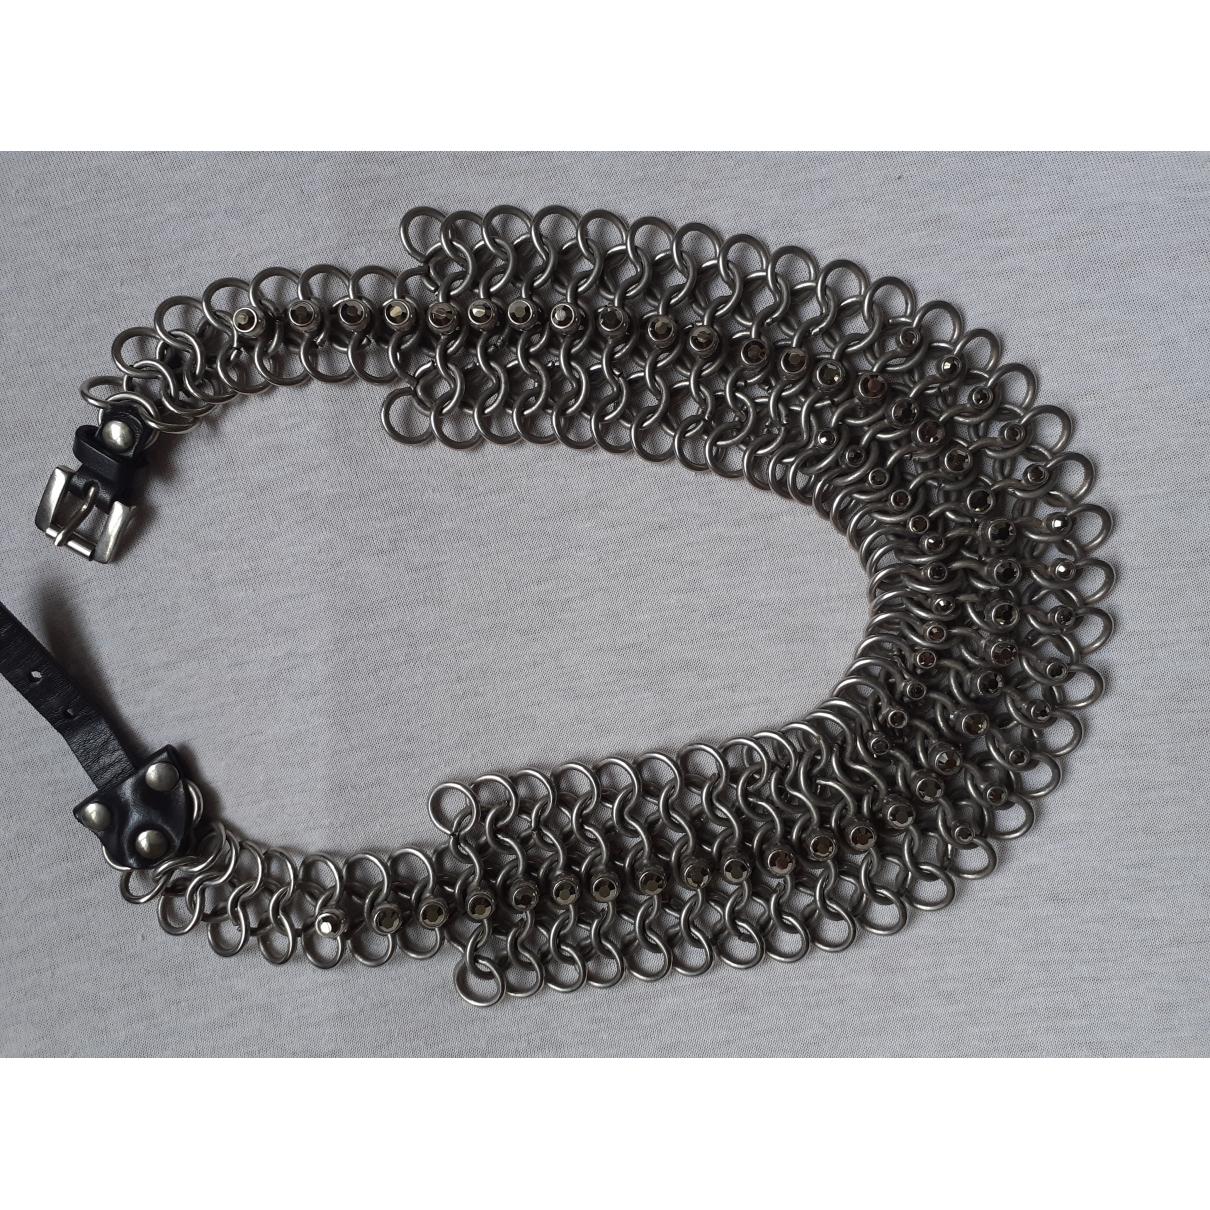 Jean Paul Gaultier \N Grey Metal necklace for Women \N